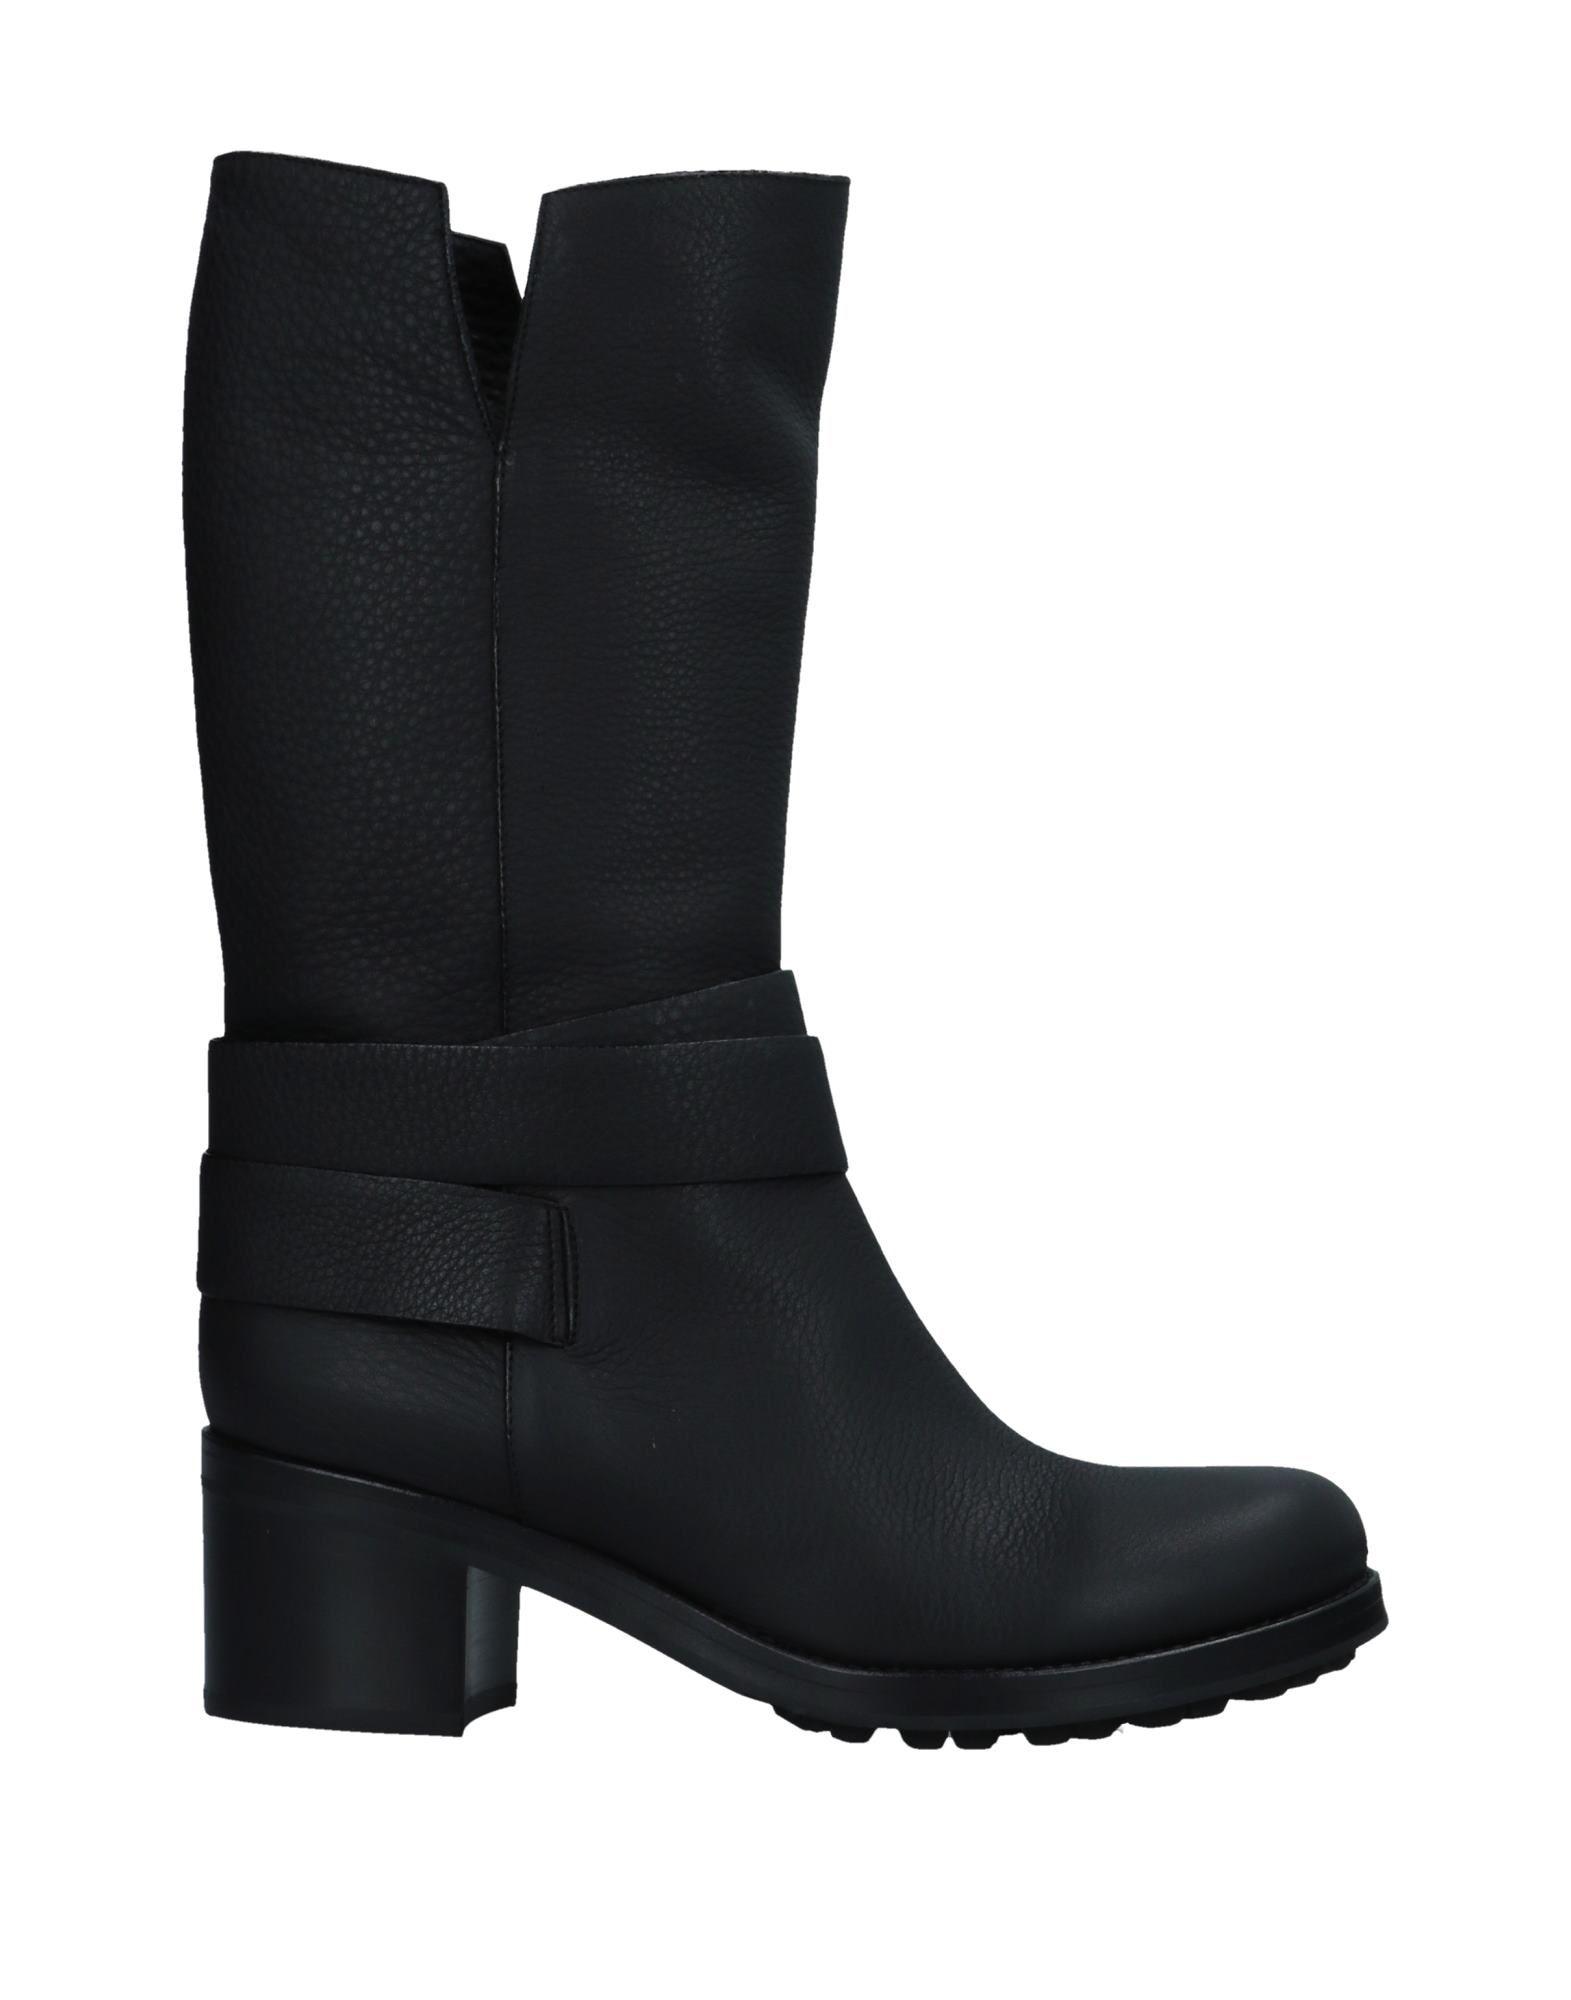 Roberto Del Carlo Stiefel Damen Schuhe  11530528ULGünstige gut aussehende Schuhe Damen b632f9